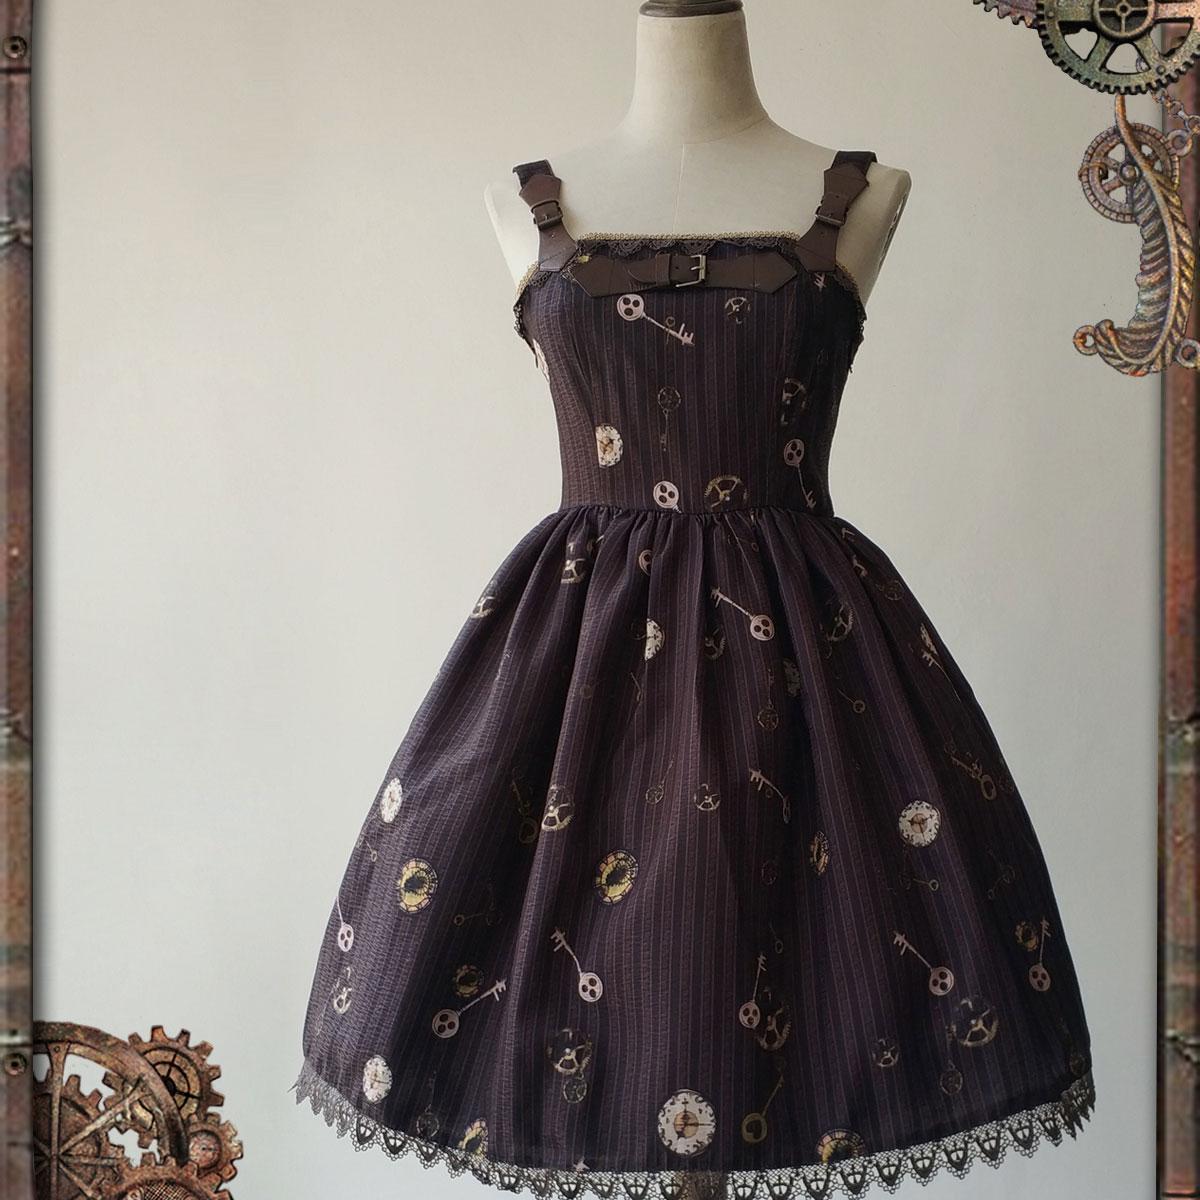 Steampunk Style Female Mini Dress Mechanical Doll Series Gear Printed JSK Dress *Pre-order*